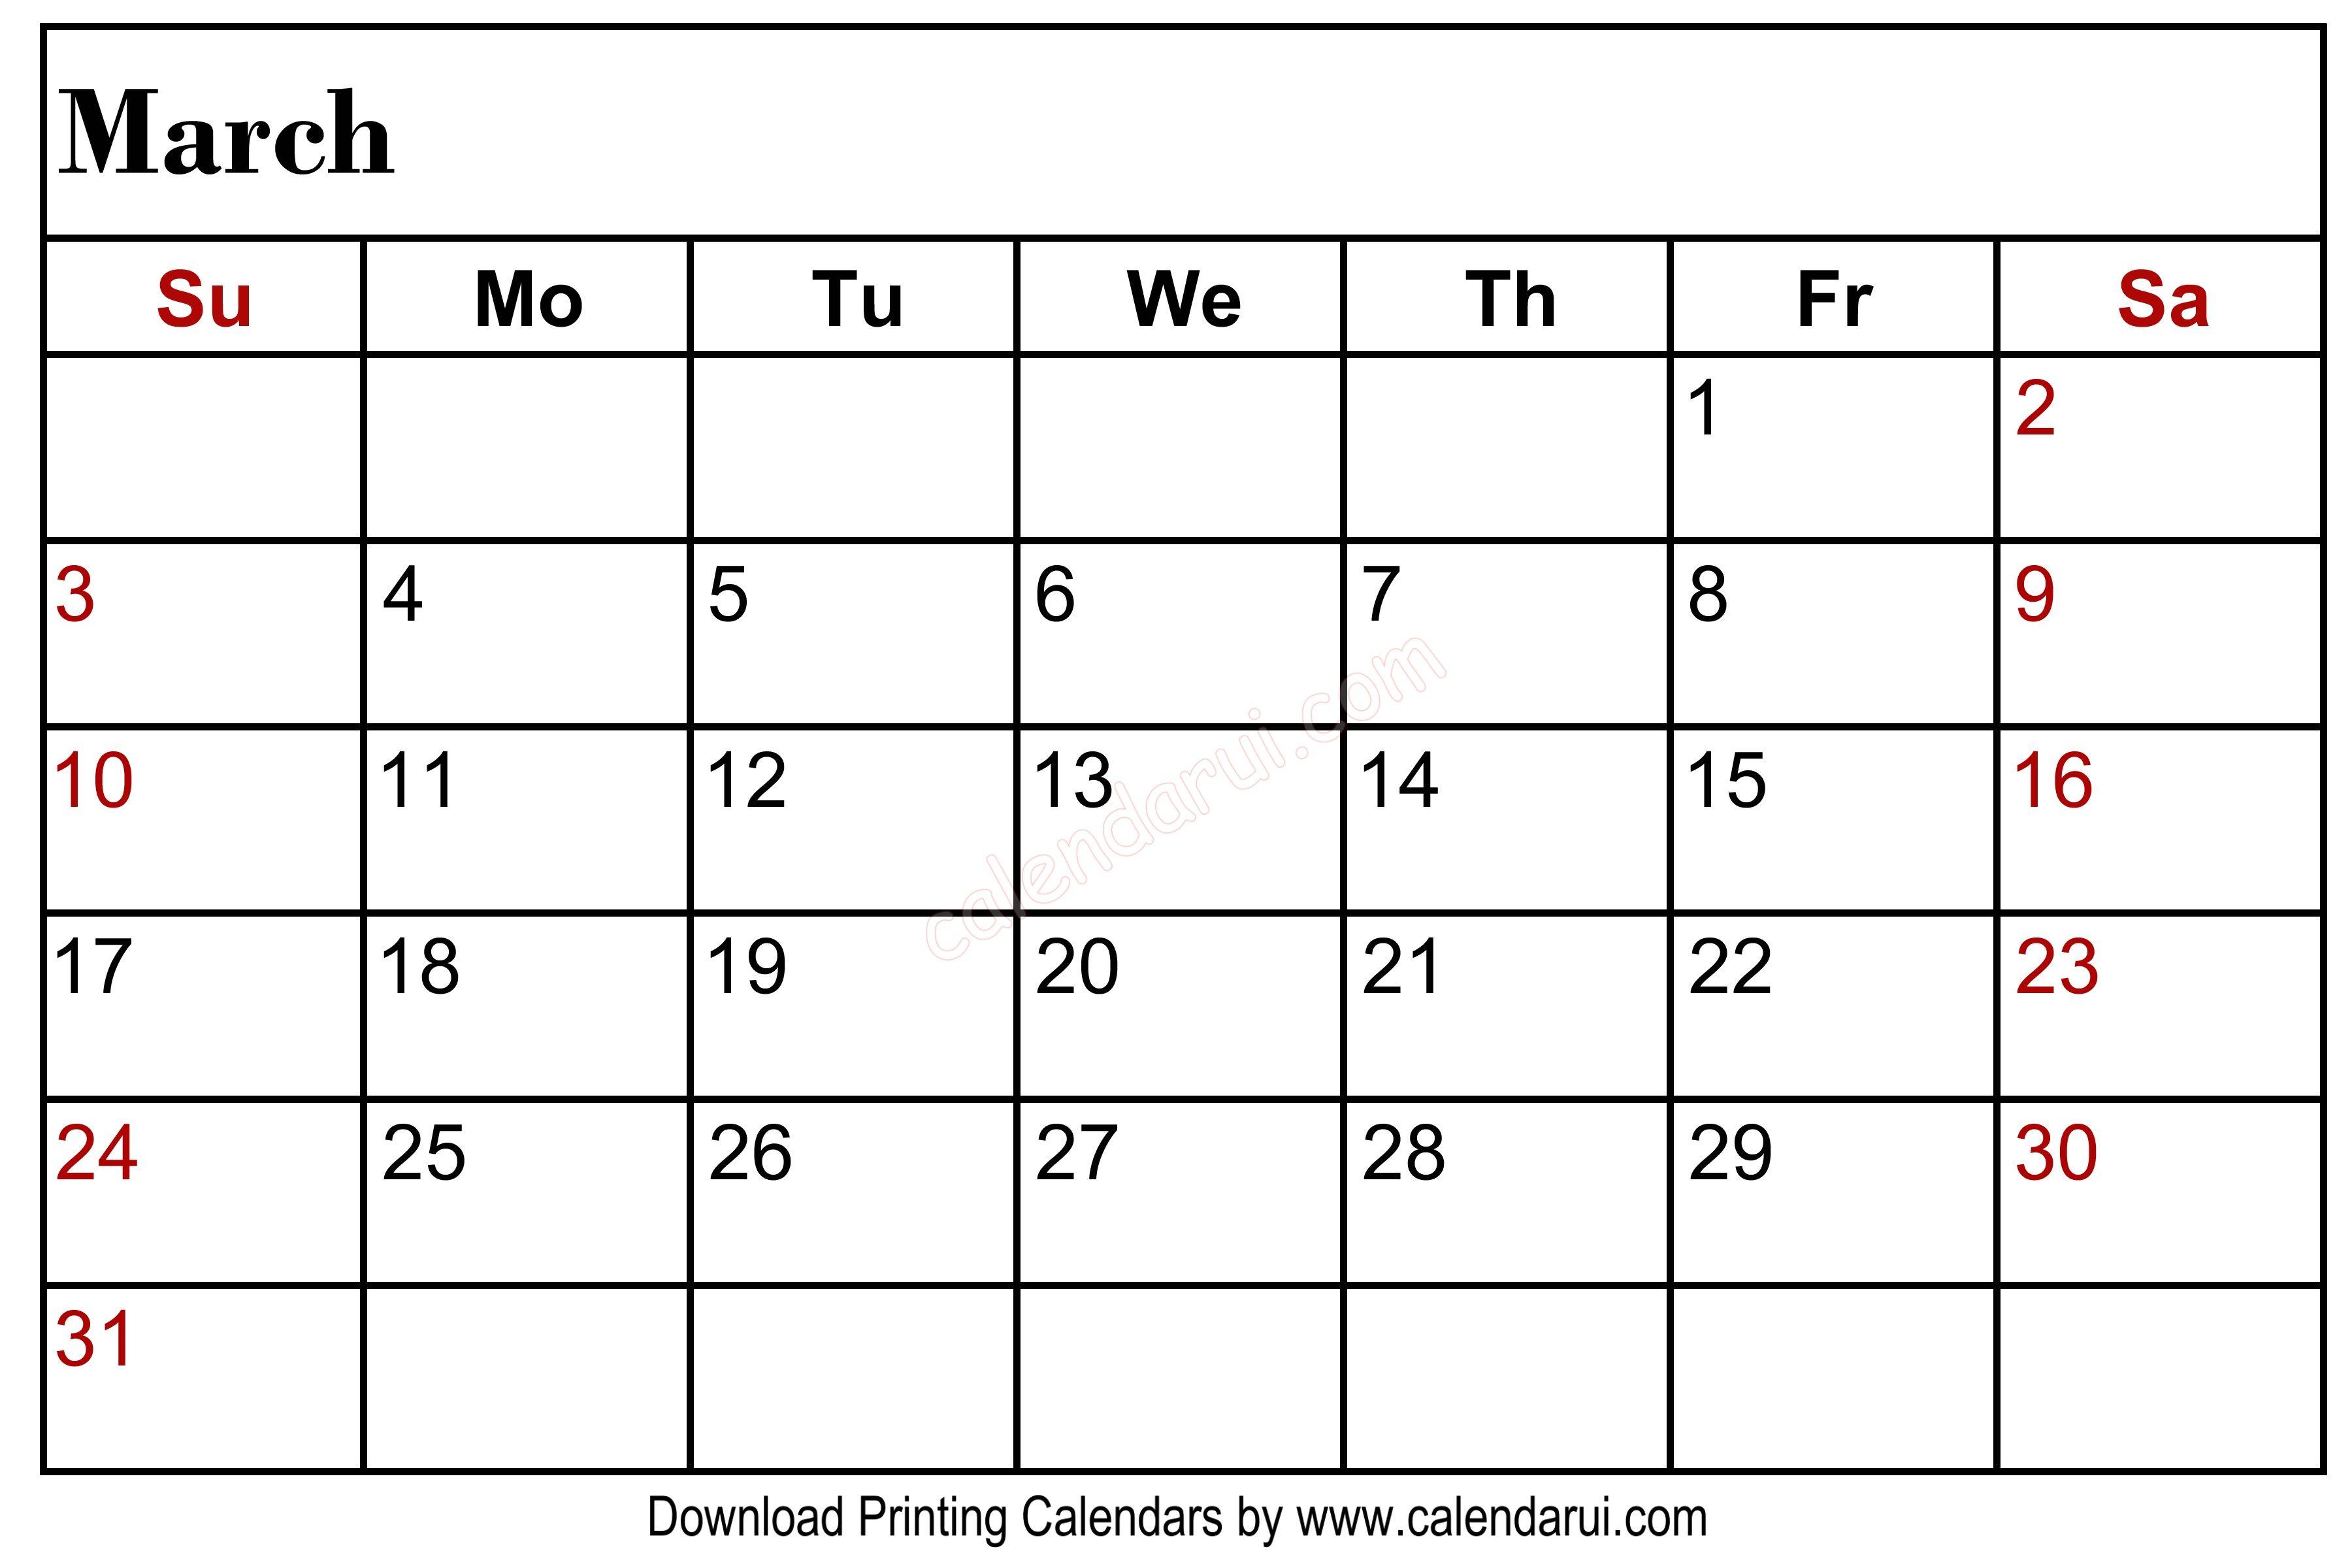 March Blank Calendar Printable Left Header